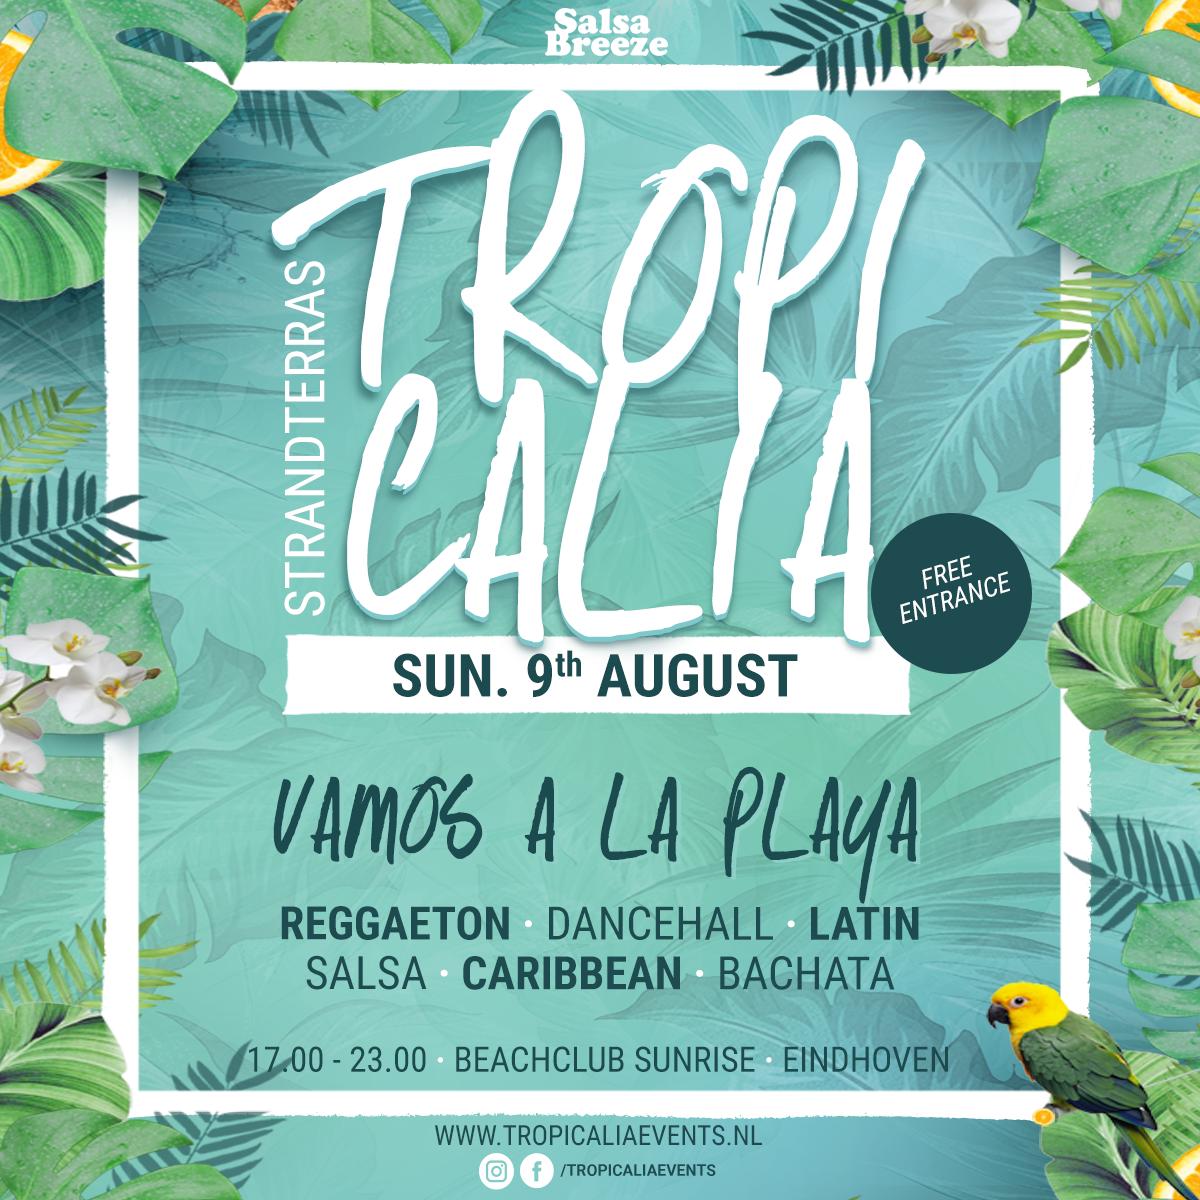 Tropicalia Strandterras 09.08.20 - Beachclub Sunrise (Eindhoven)